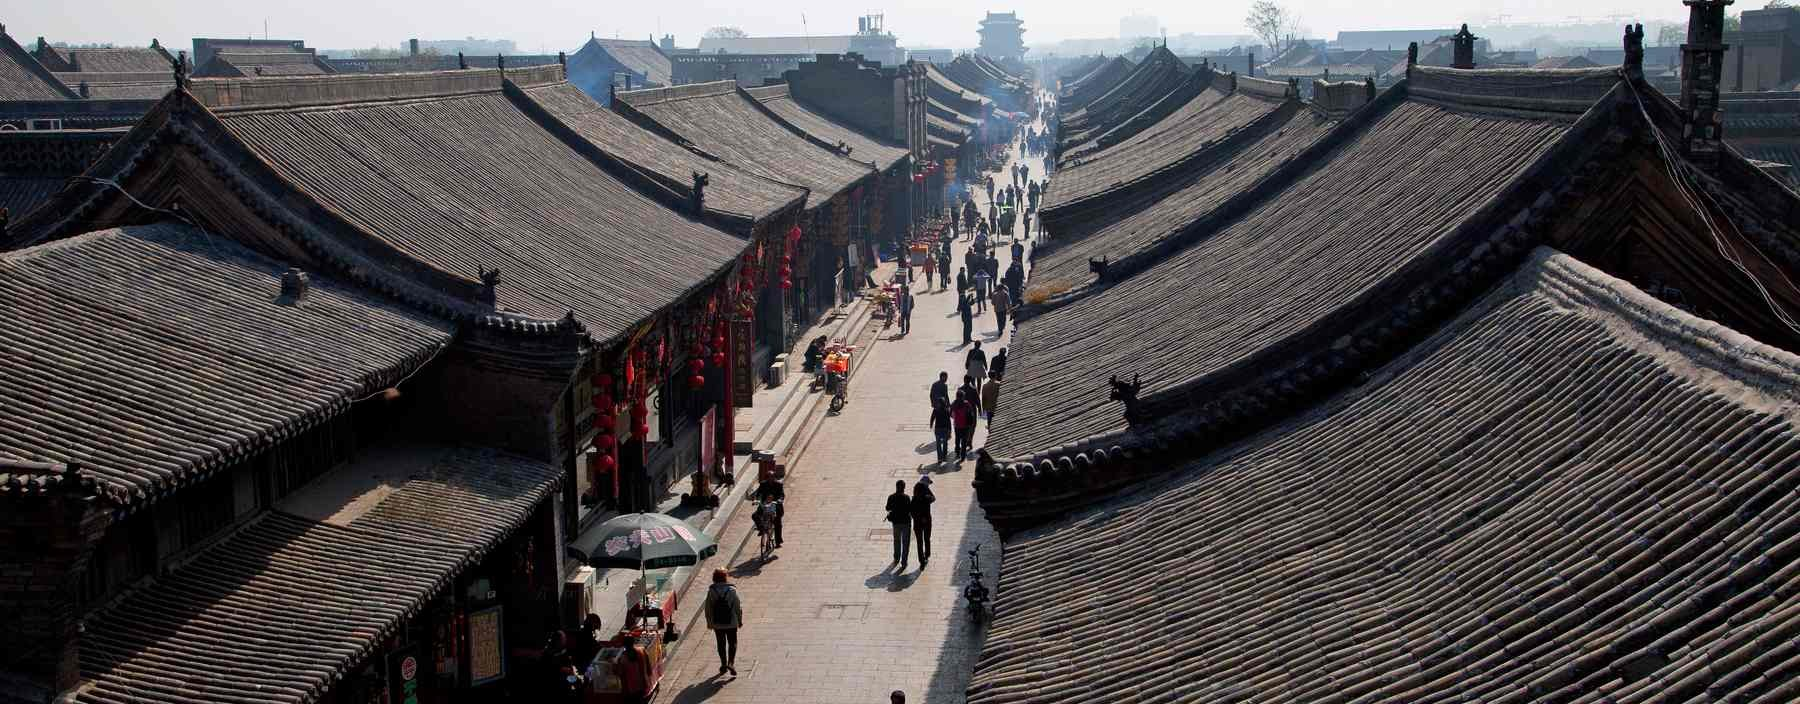 cn, pingyao, oude stad (1).jpg